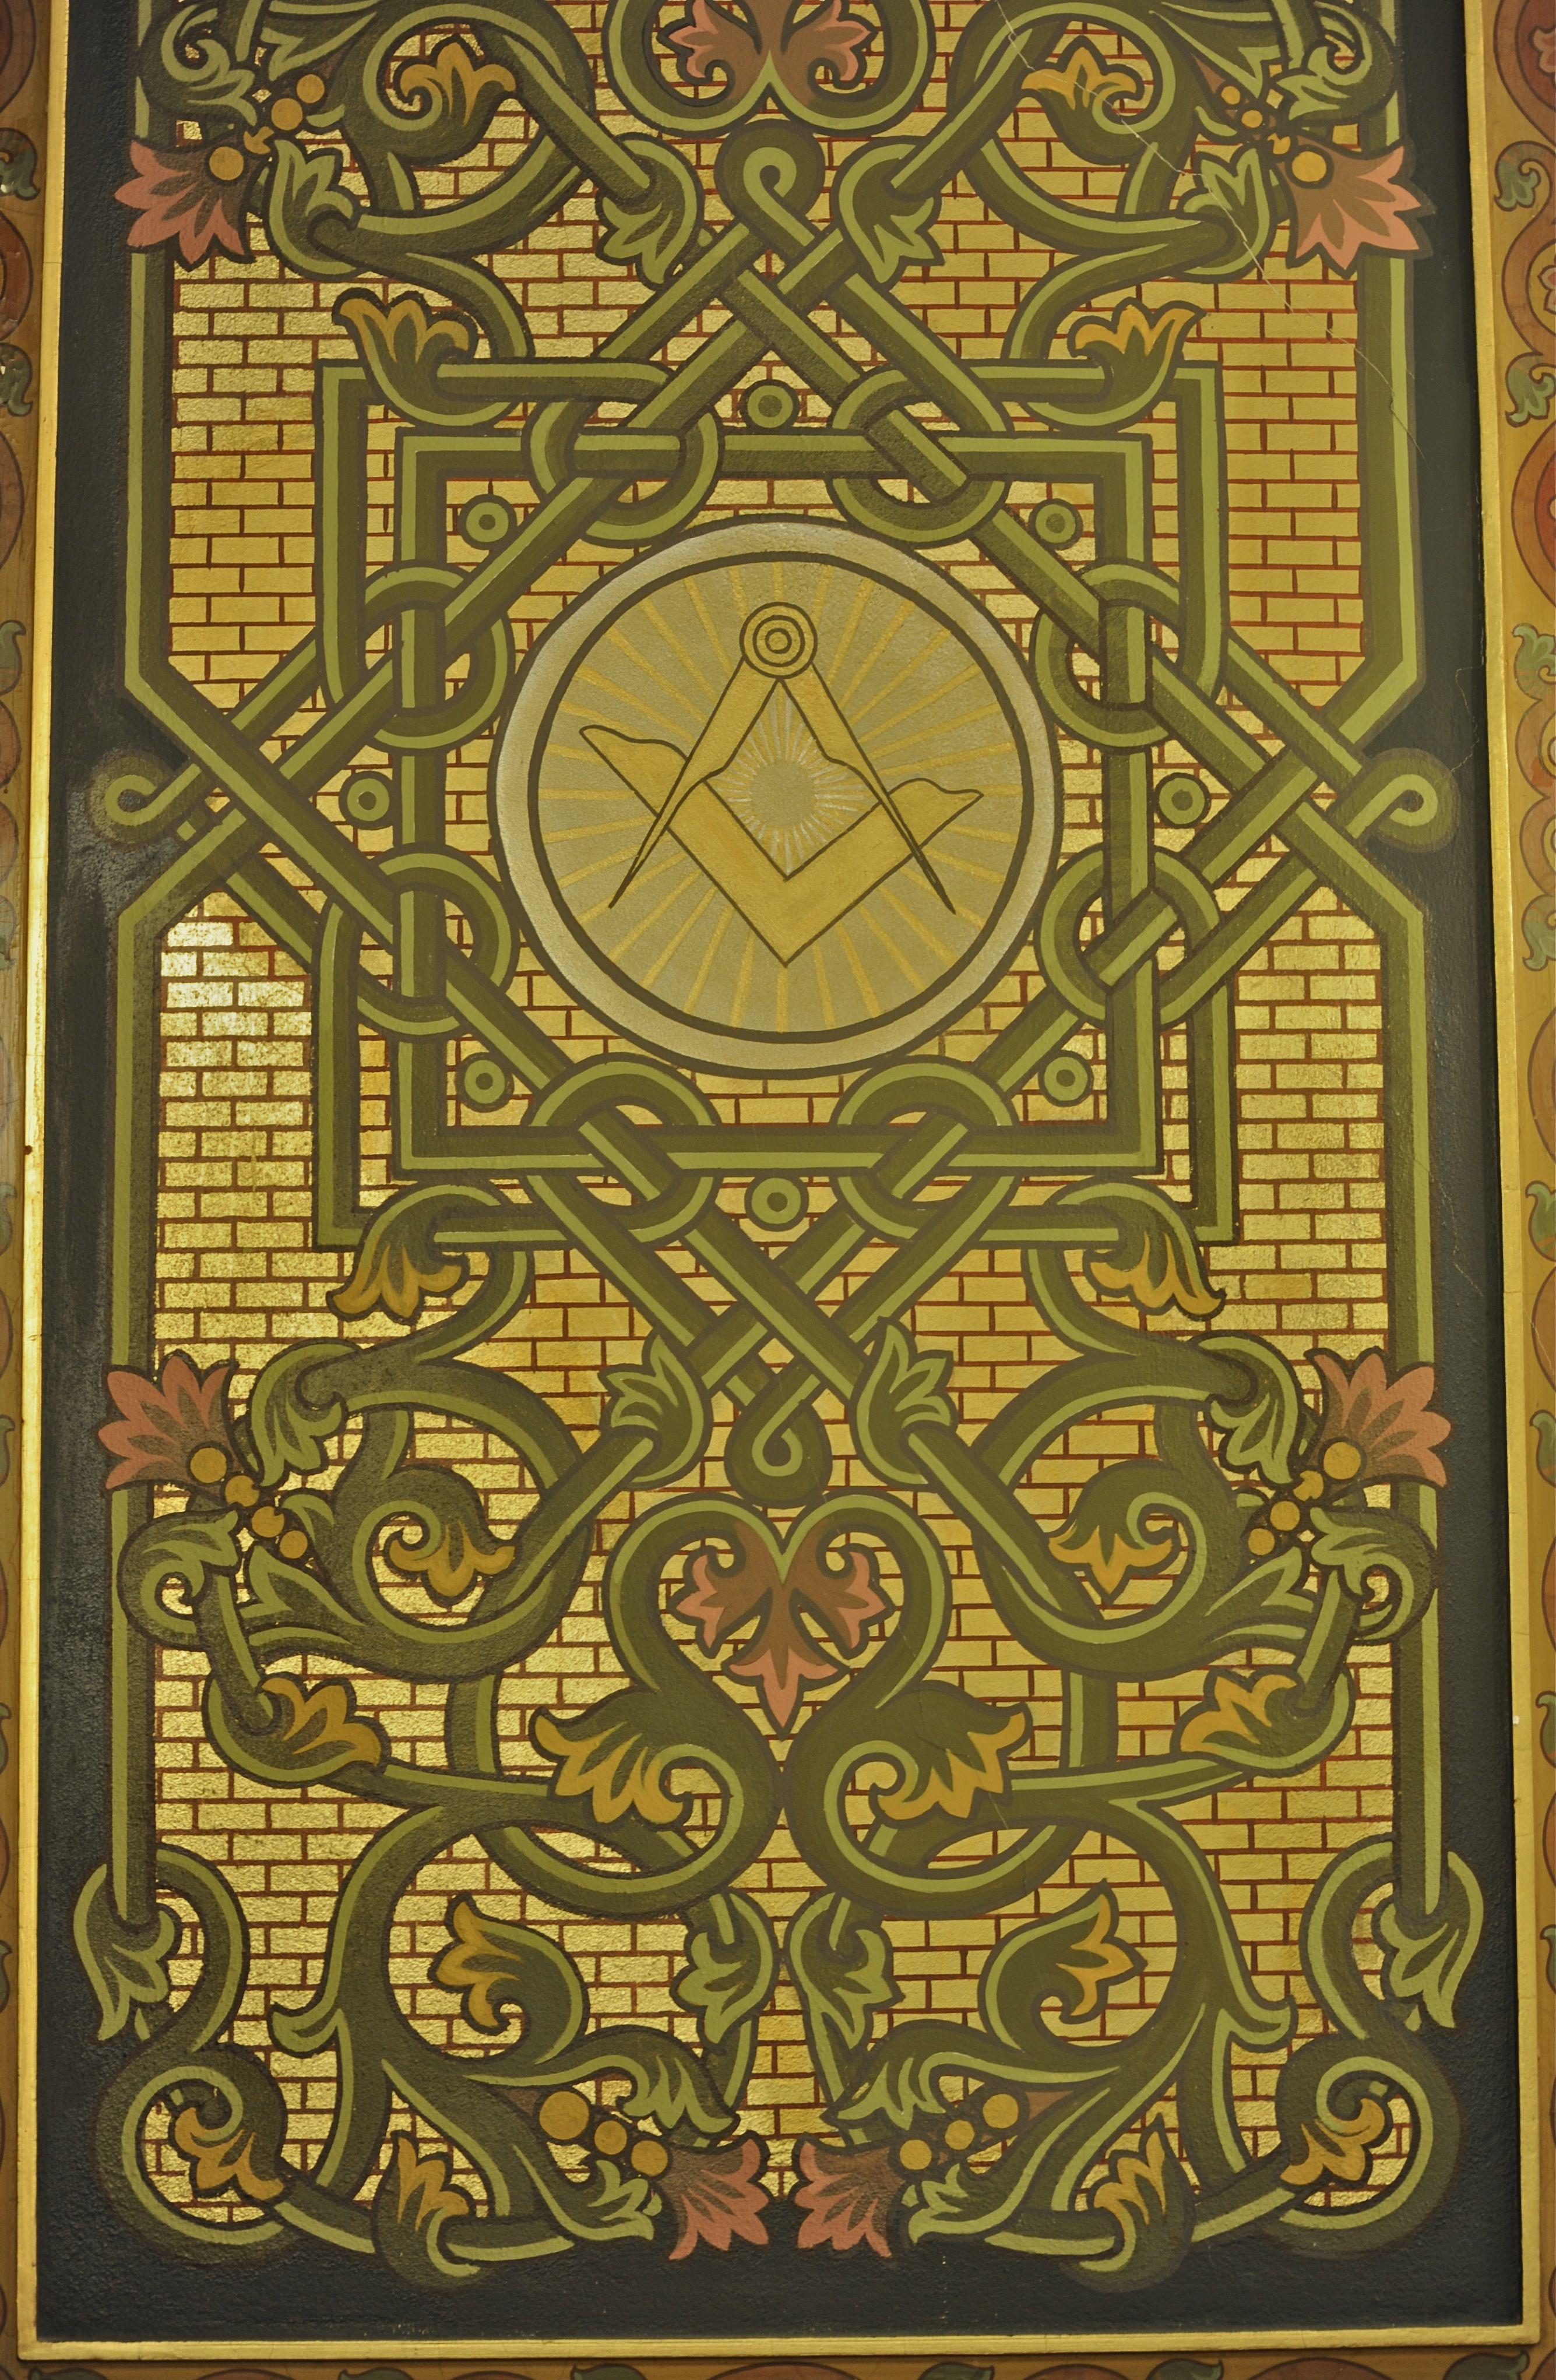 Dsc8595 square compass masonic temple grand lodge free and dsc8595 square compass masonic temple grand lodge free pronofoot35fo Images